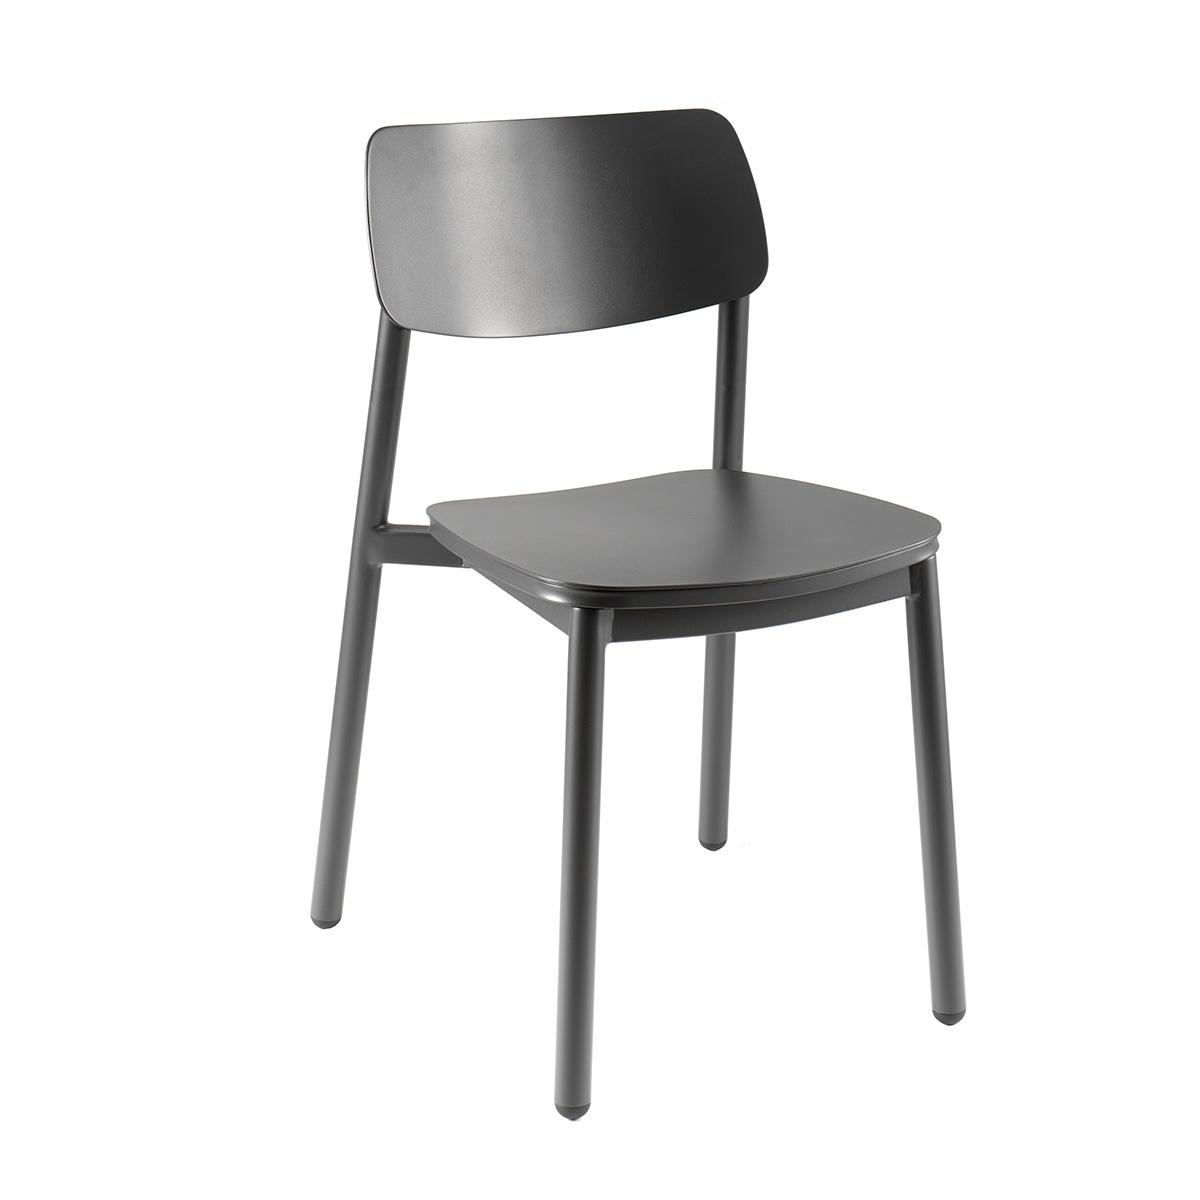 Chaise de jardin en aluminium anthracite